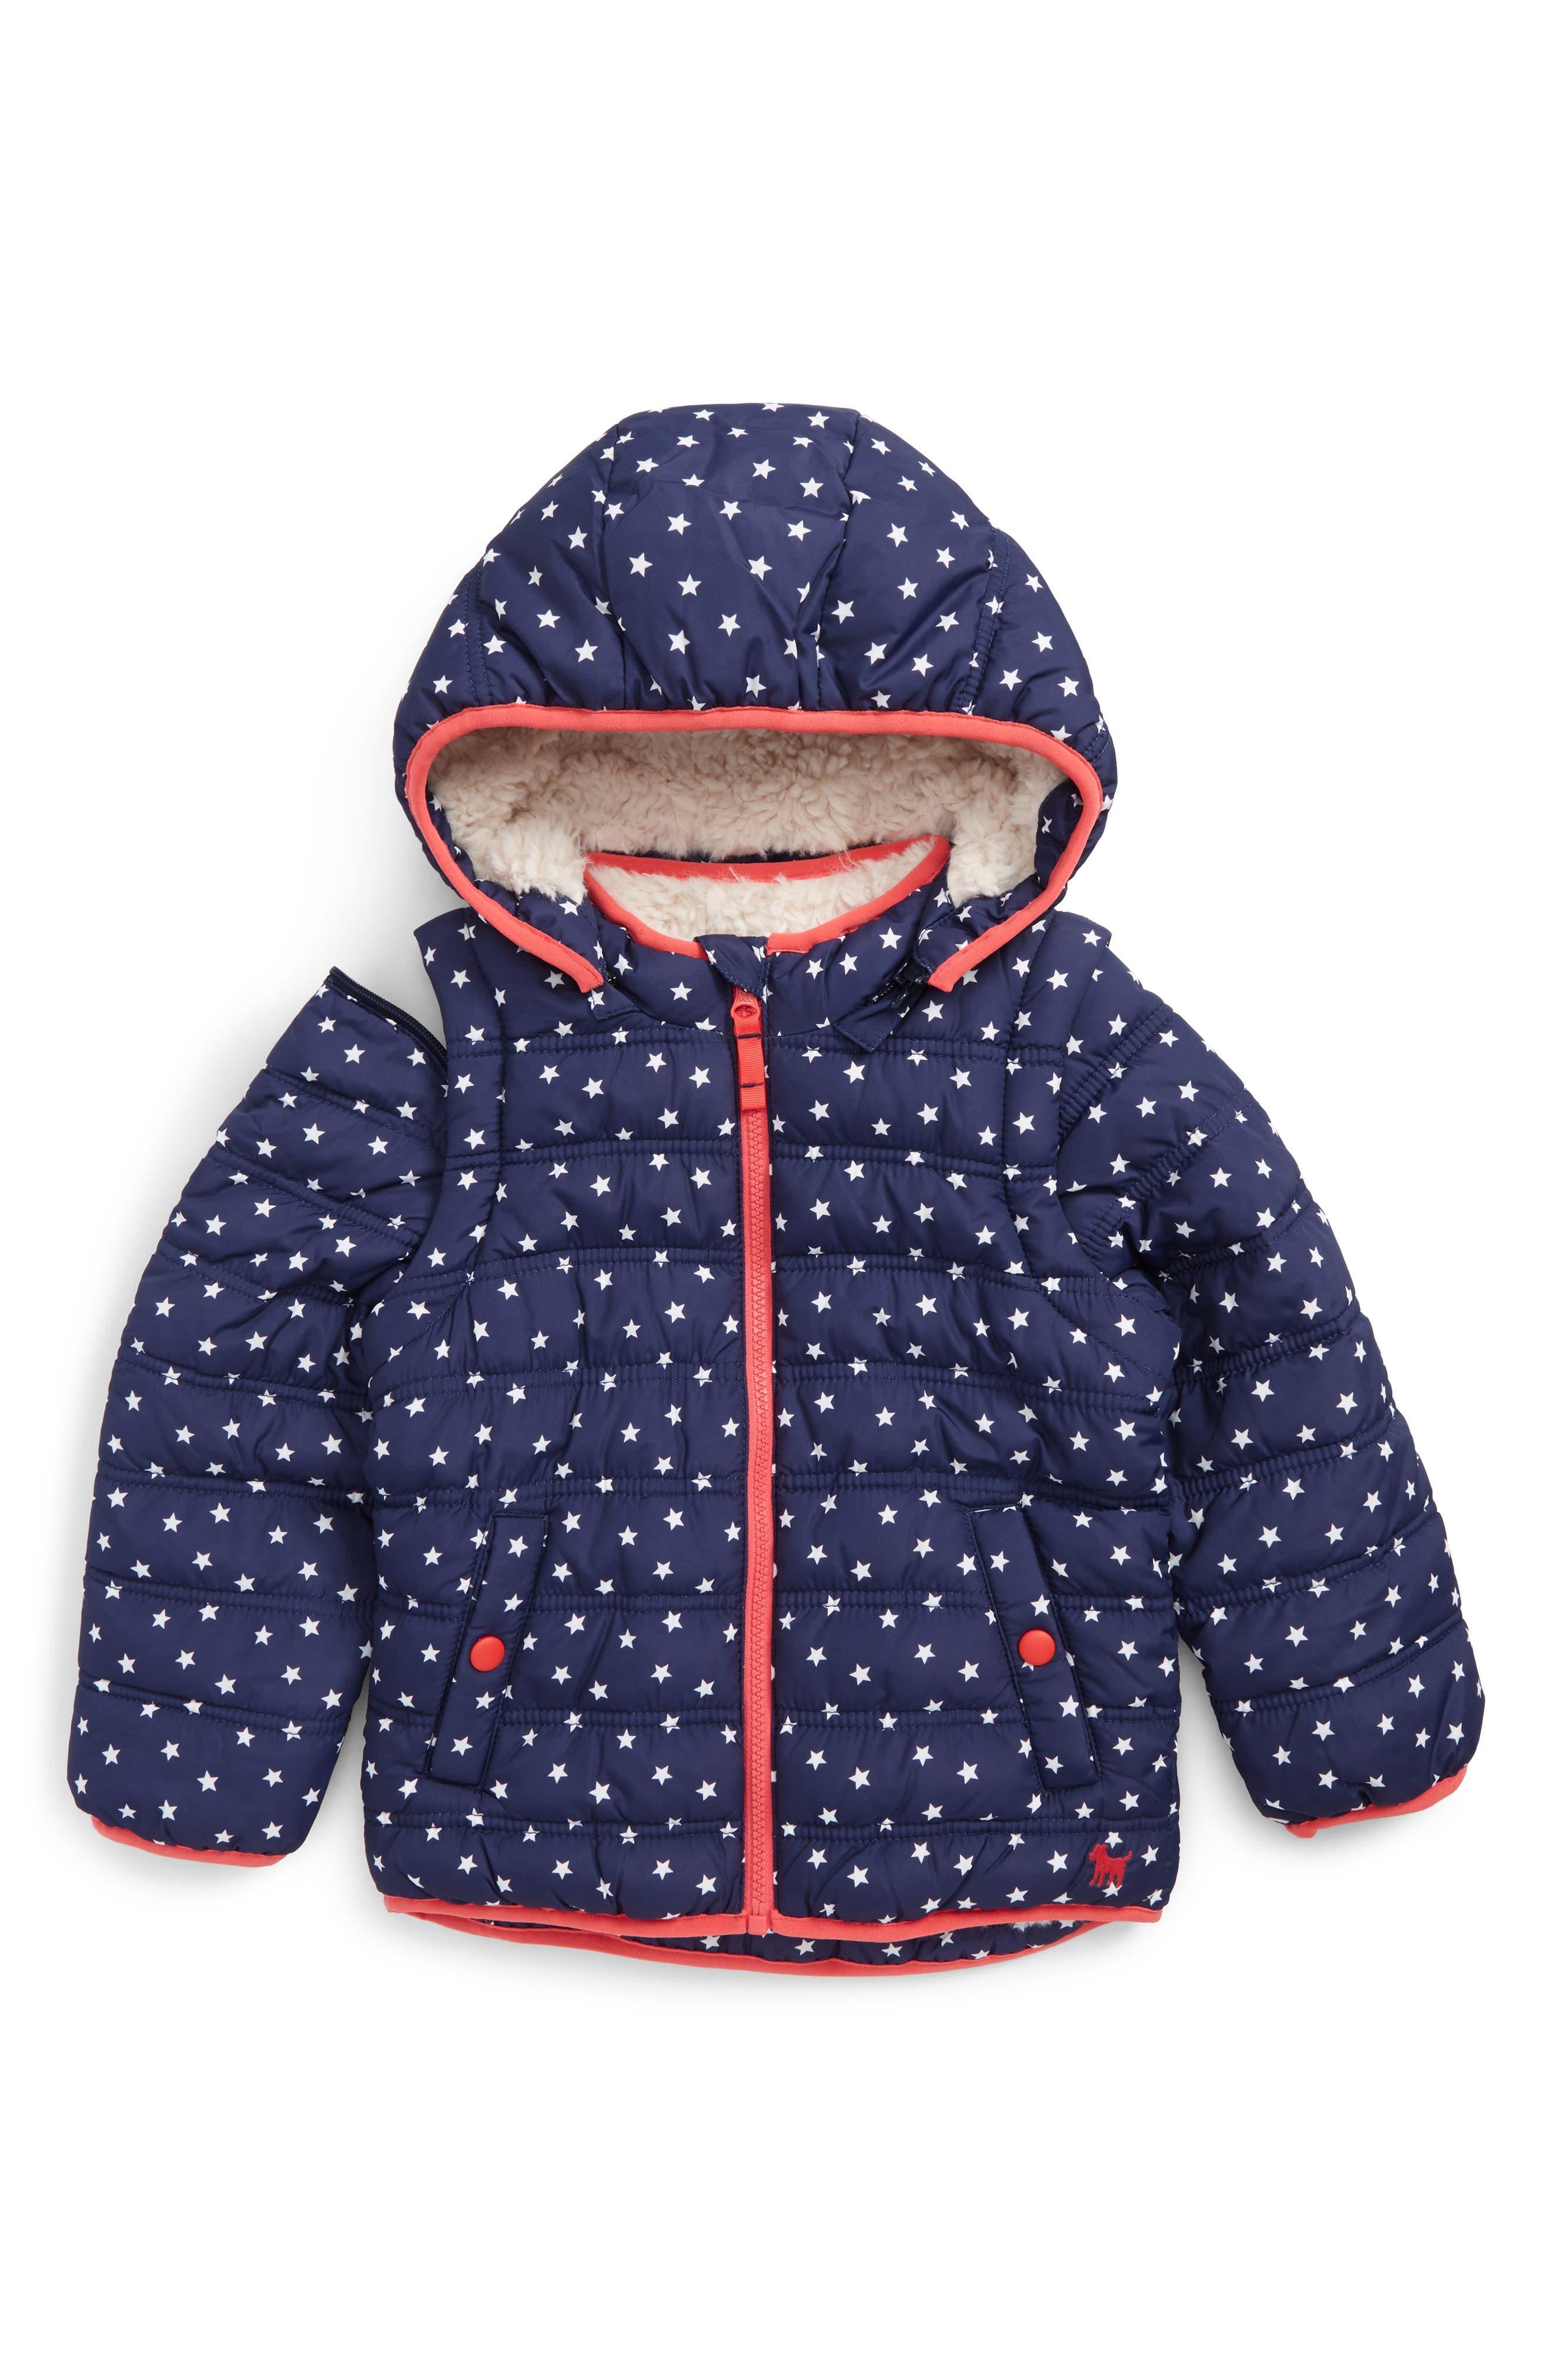 Alternate Image 1 Selected - Mini Boden 2-in-1 Water Resistant Padded Jacket (Toddler Girls, Little Girls & Big Girls)